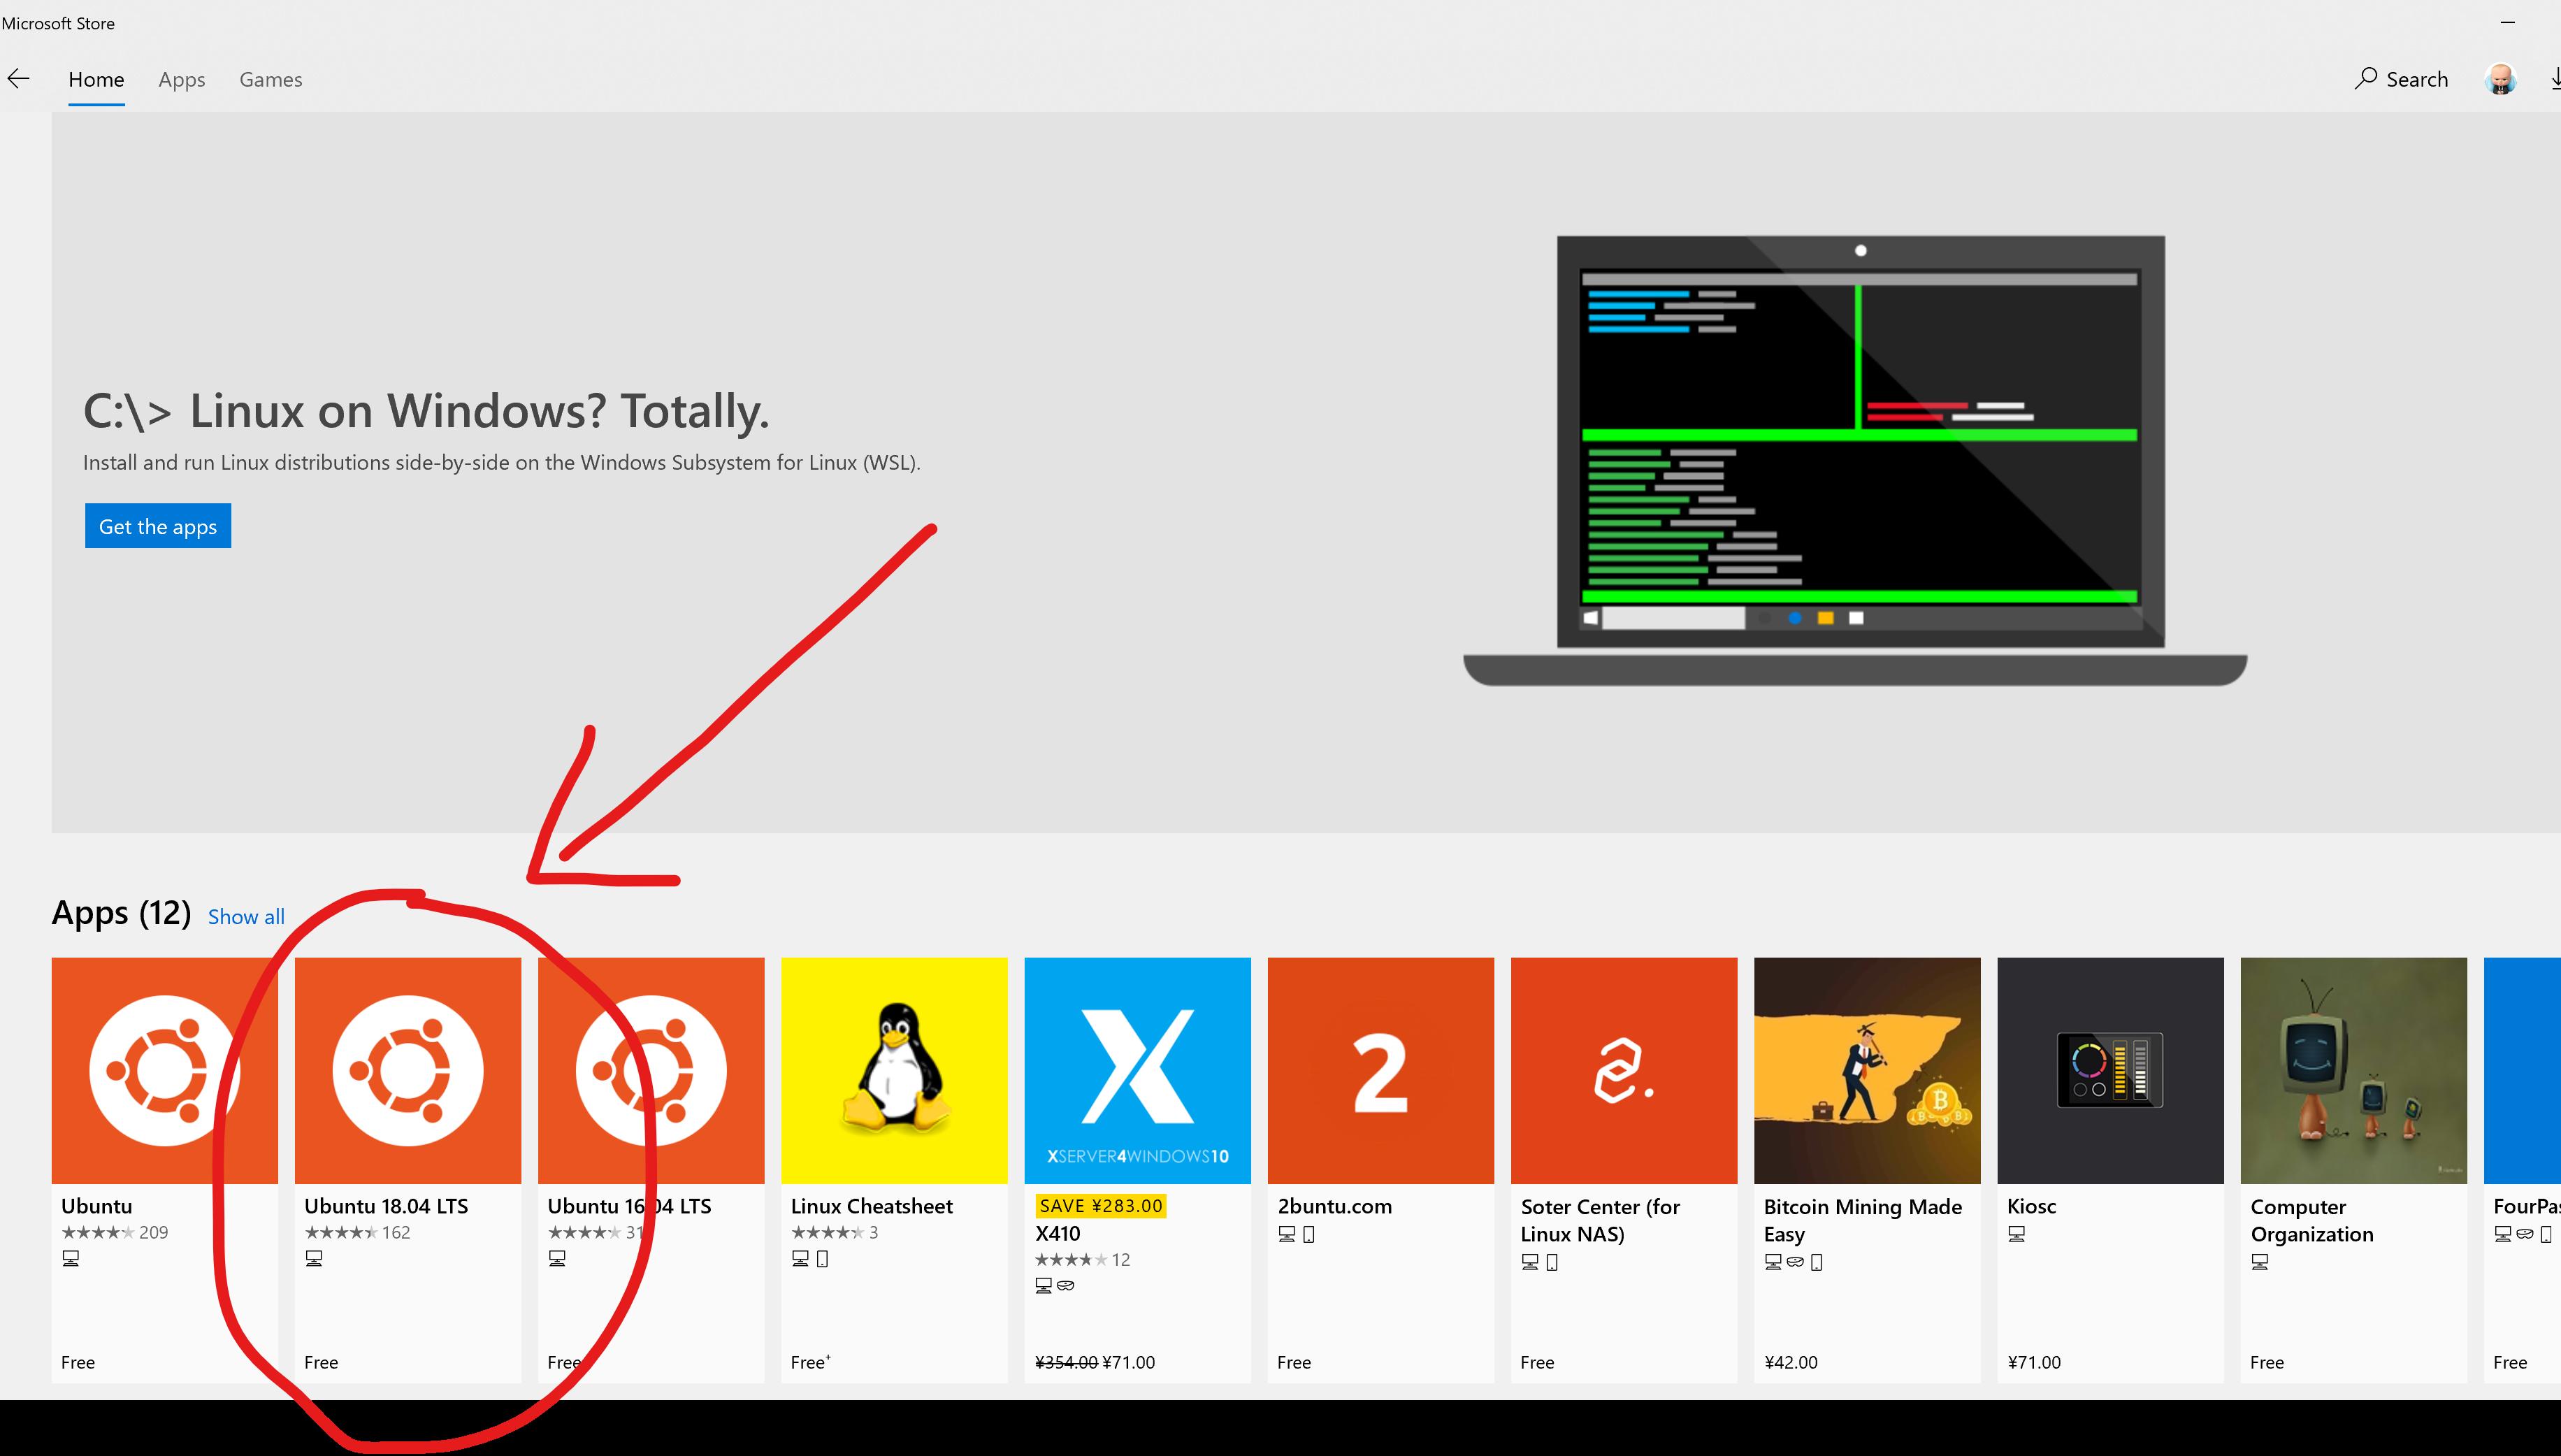 windows应用商店找到ubuntu18.04